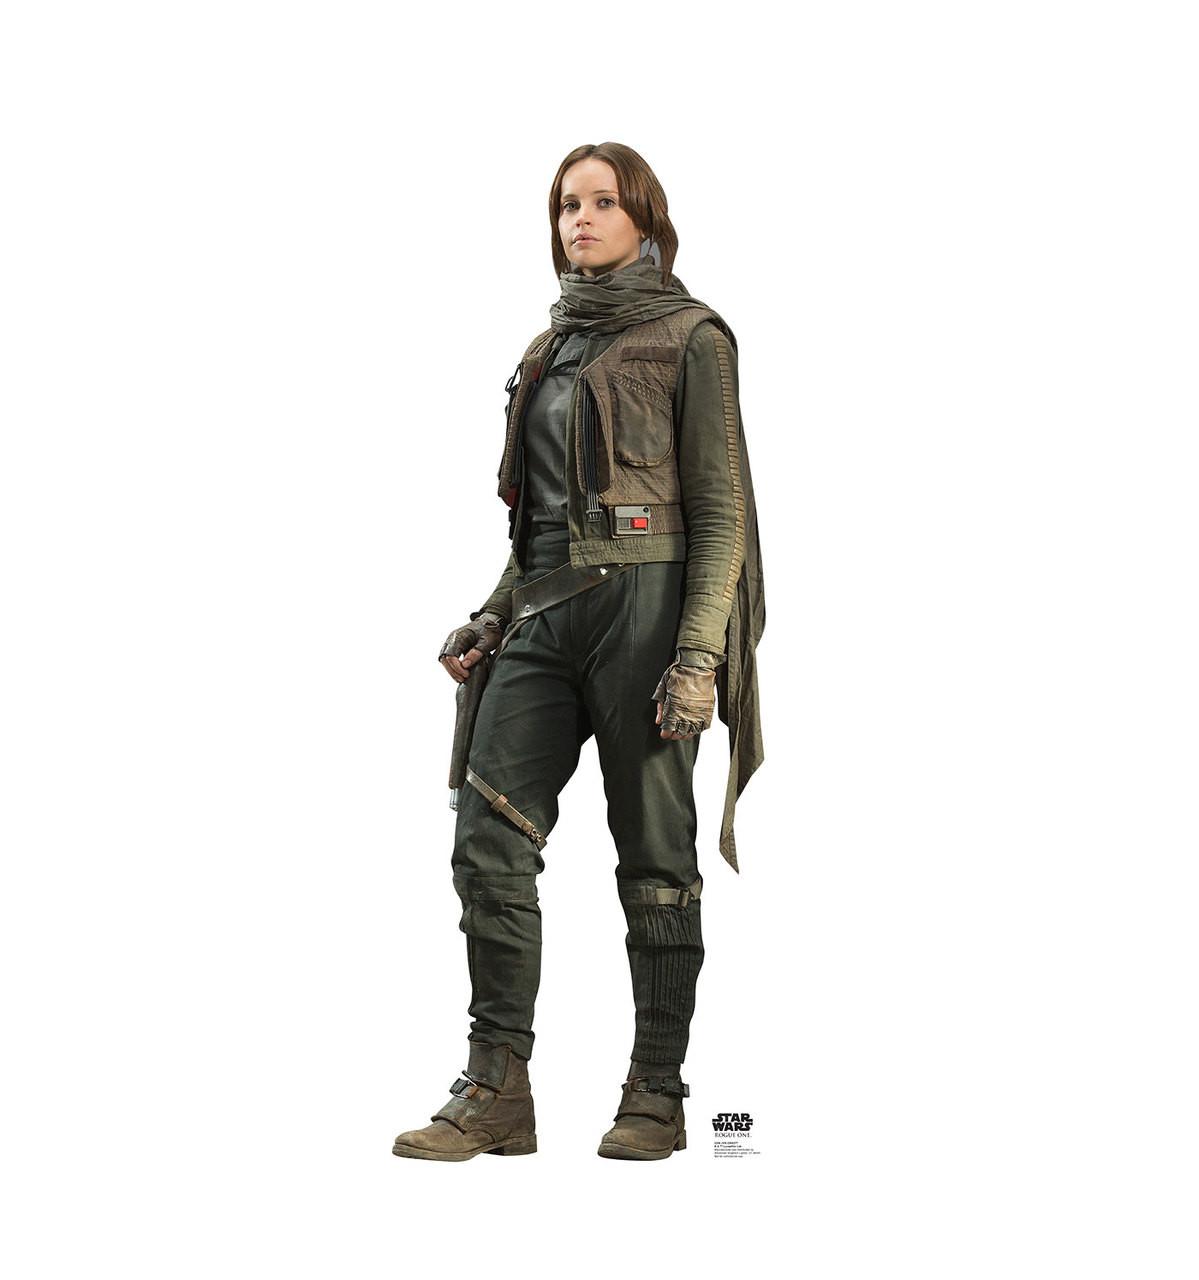 Life-size Jyn Erso (Rogue One) Cardboard Standup